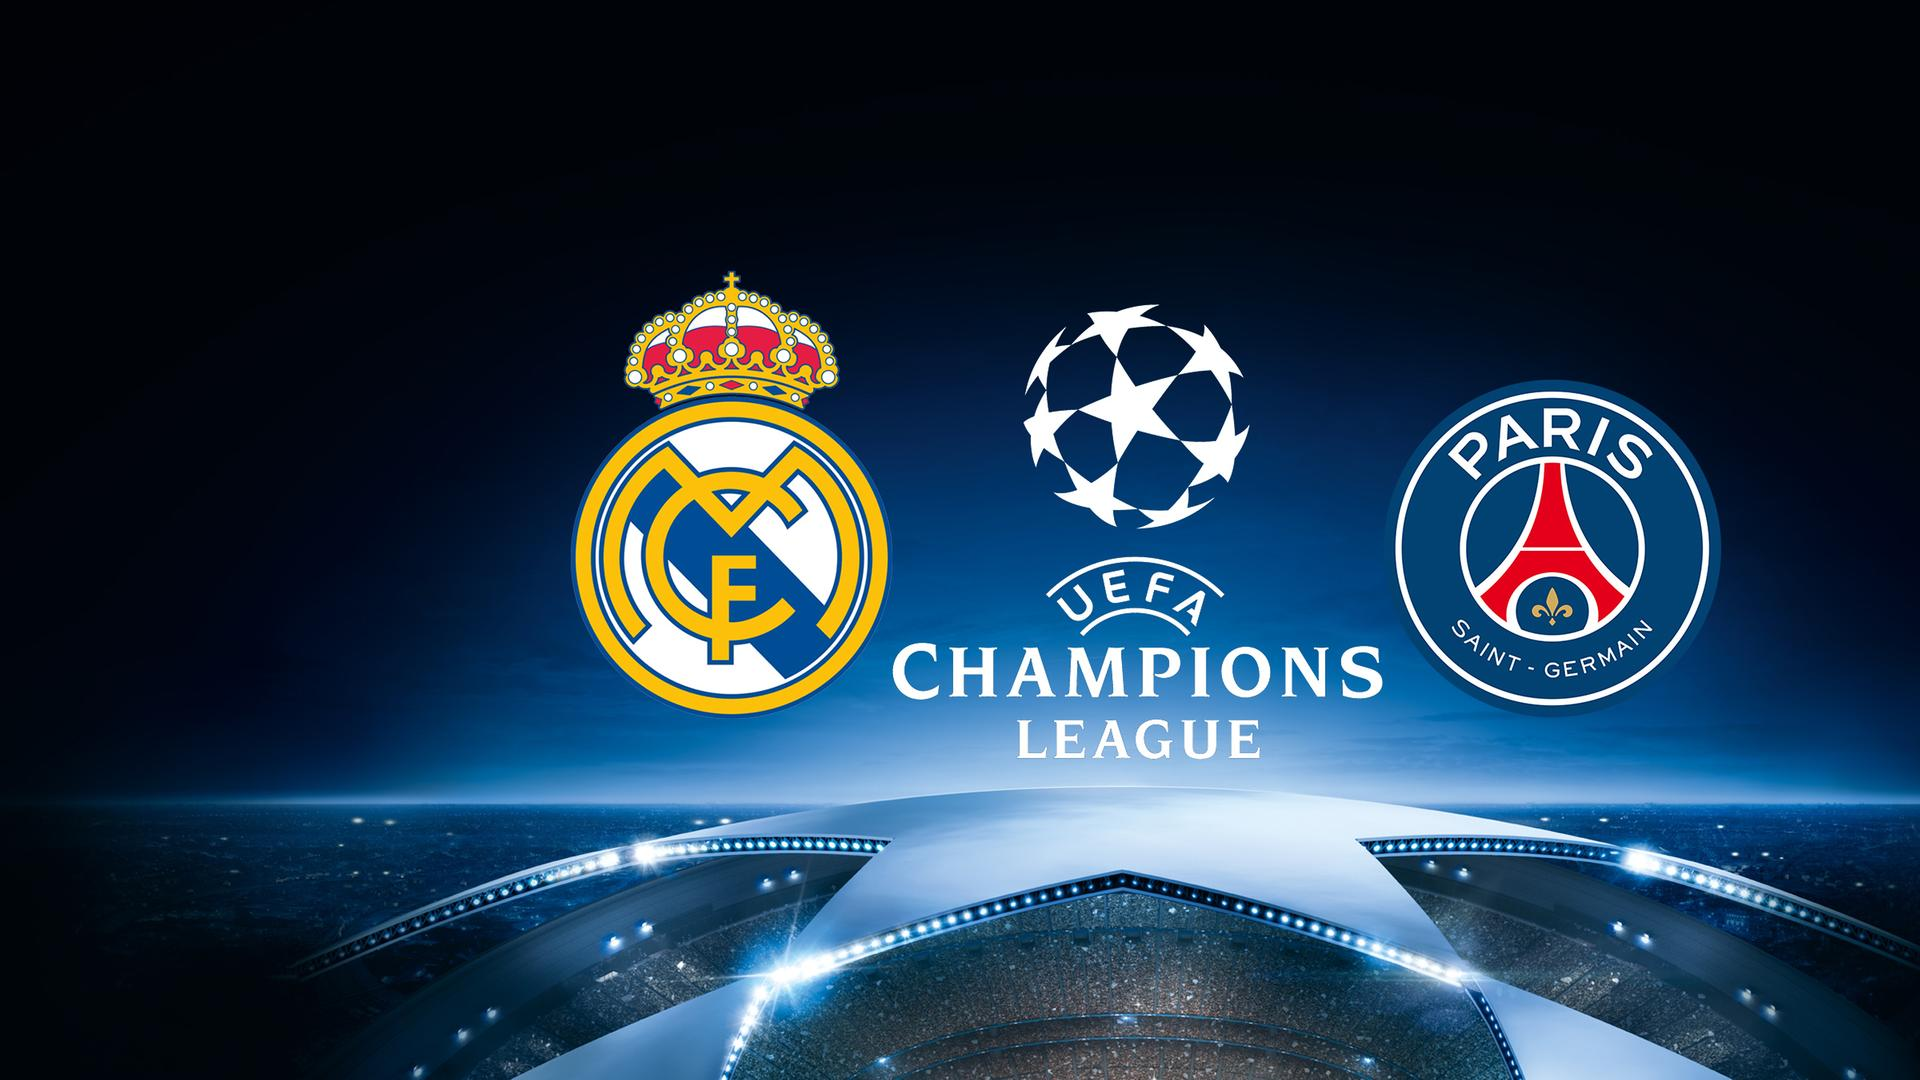 Uefa Champion League Real Madrid Paris Zdf Live Europa